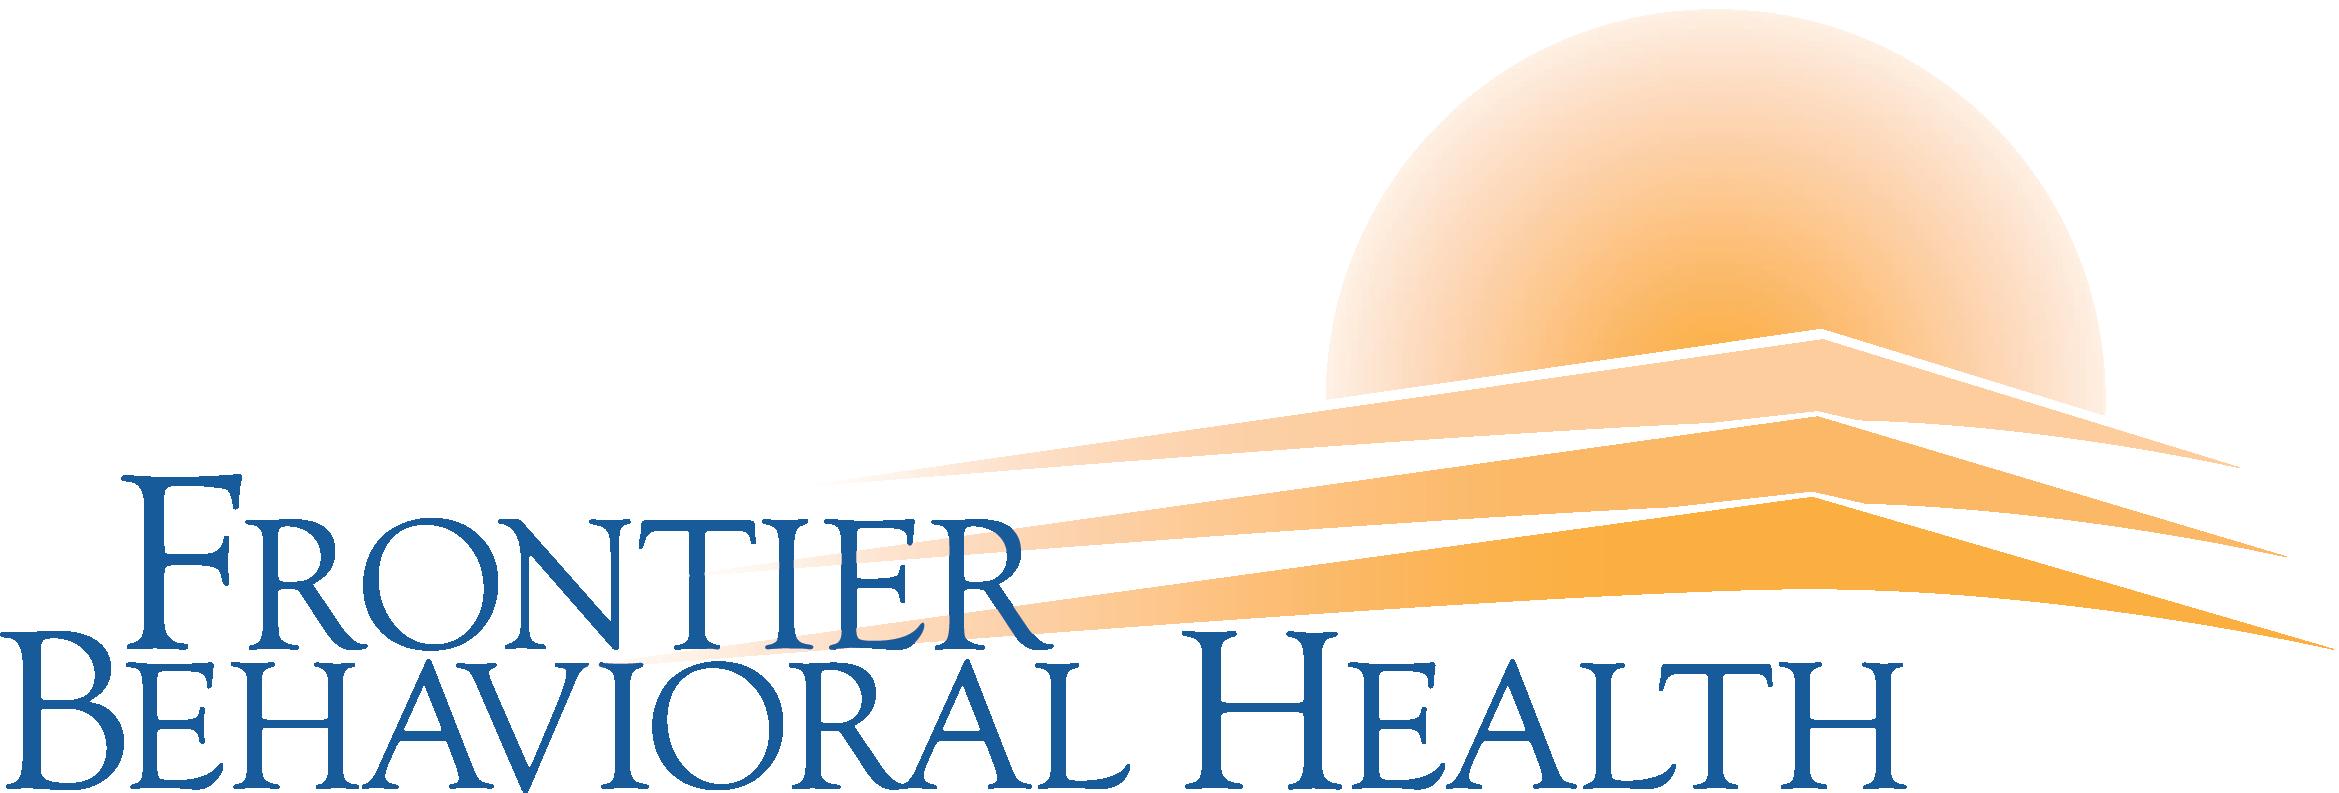 Frontier Behavioral Health Logo